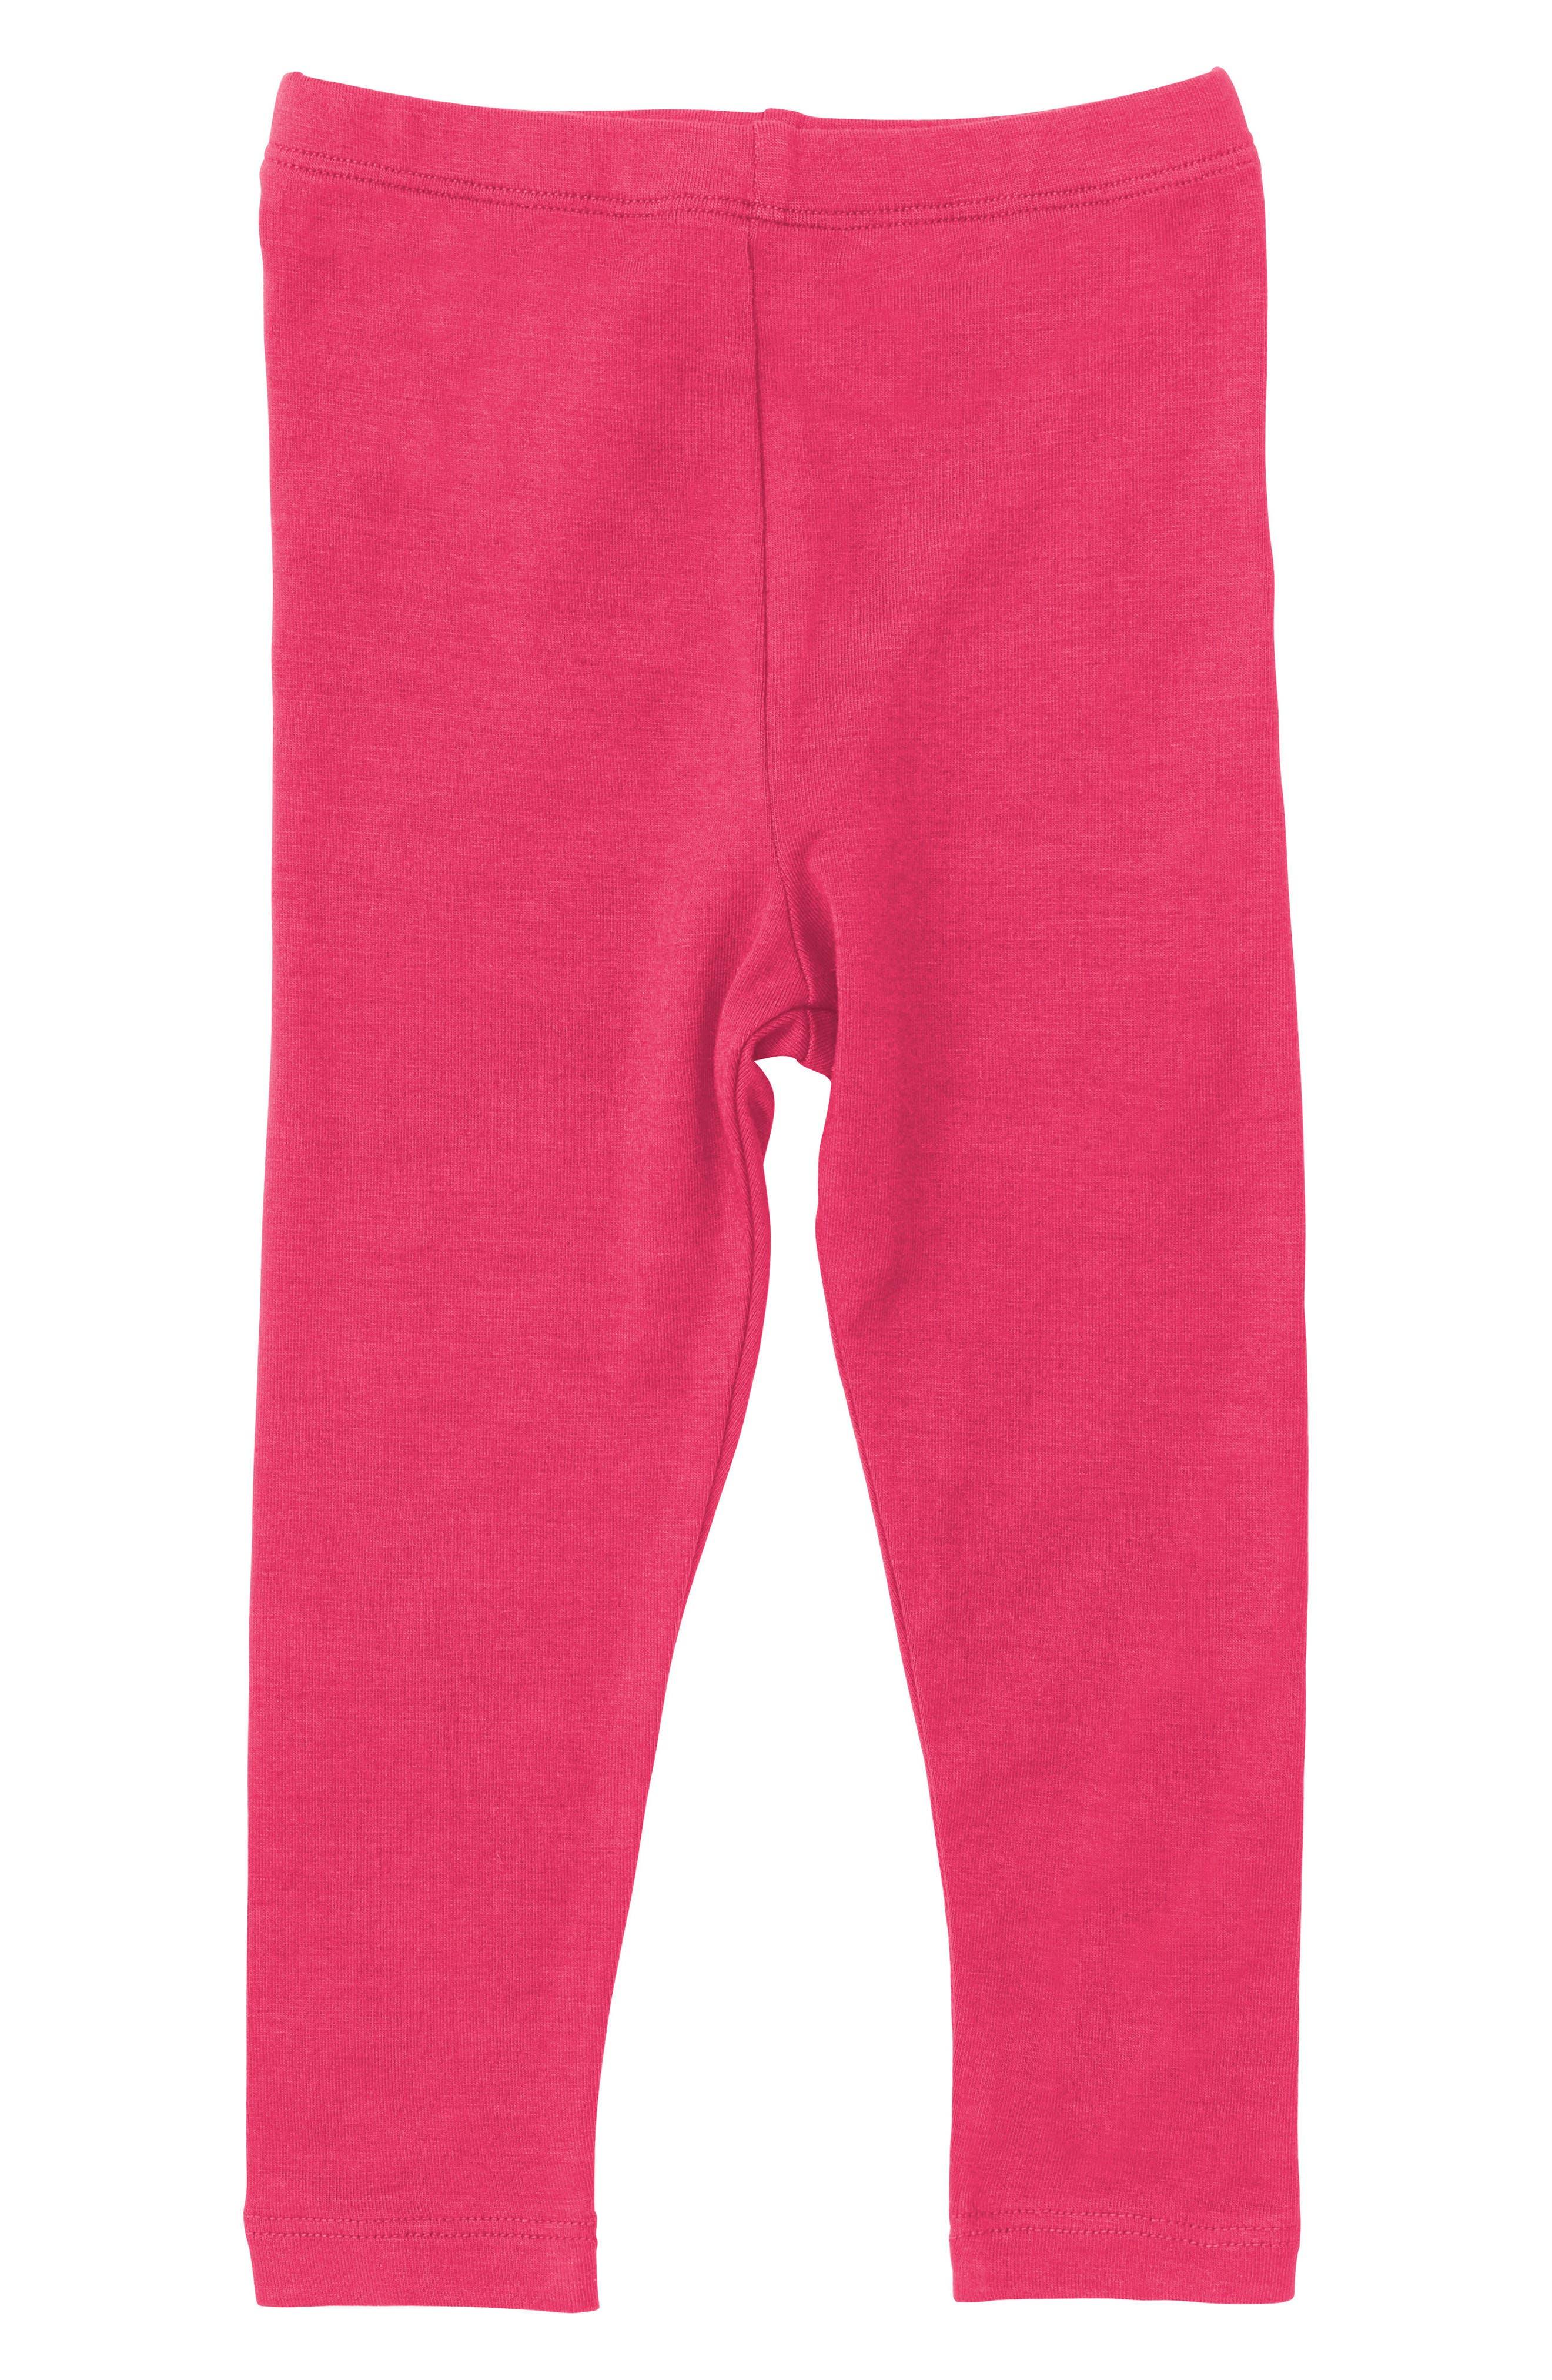 Solid Leggings,                             Main thumbnail 1, color,                             Pink